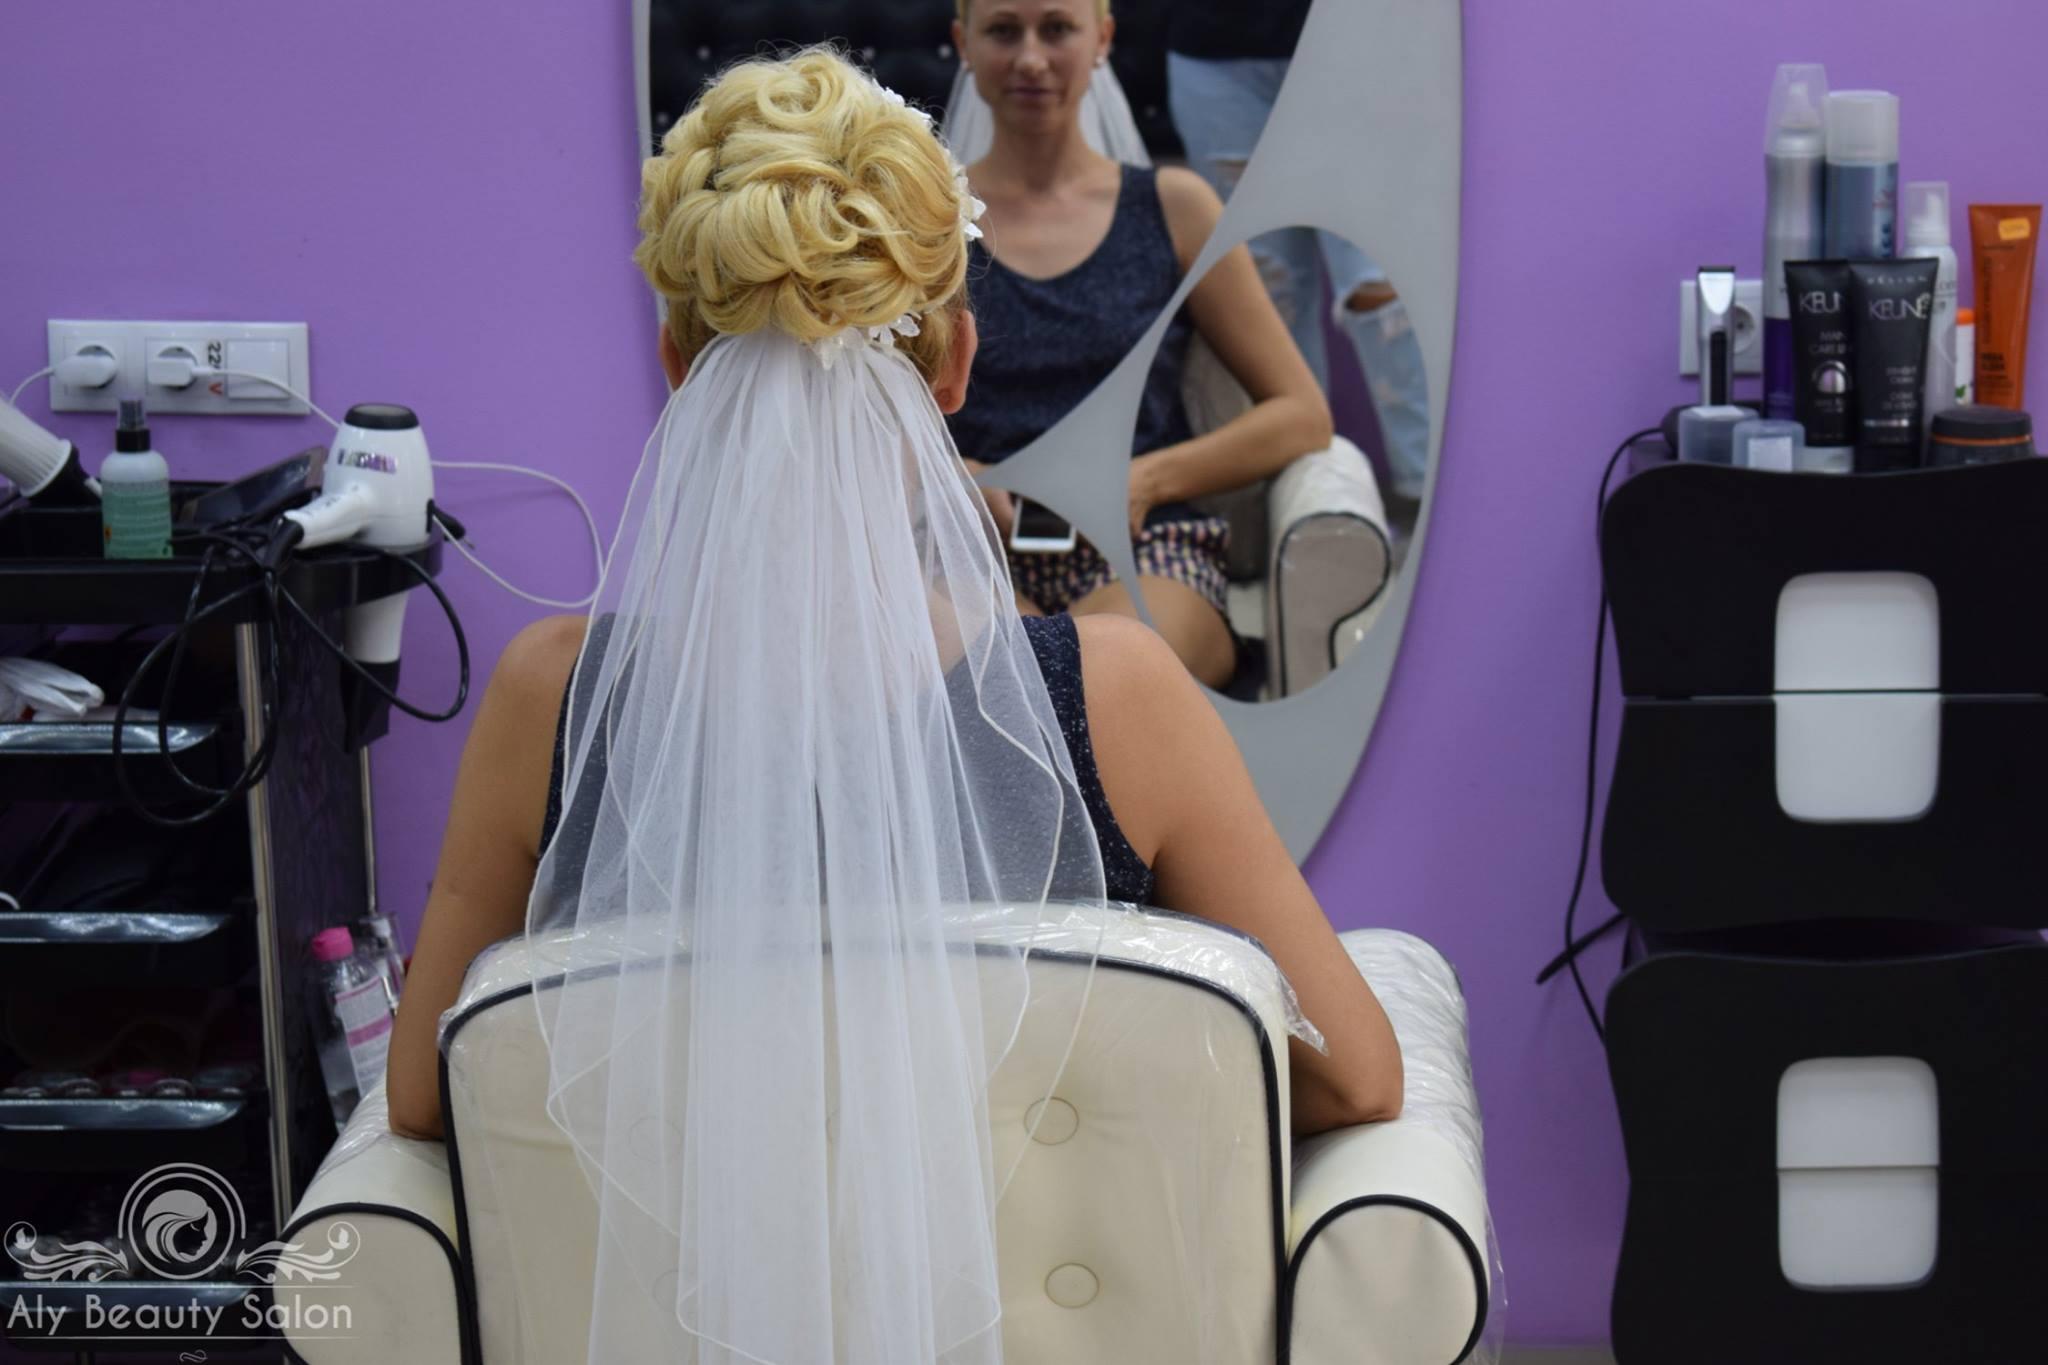 Alina Hairstylist Aly Beauty Salon Calea Vitan Sector 3 Bucuresti